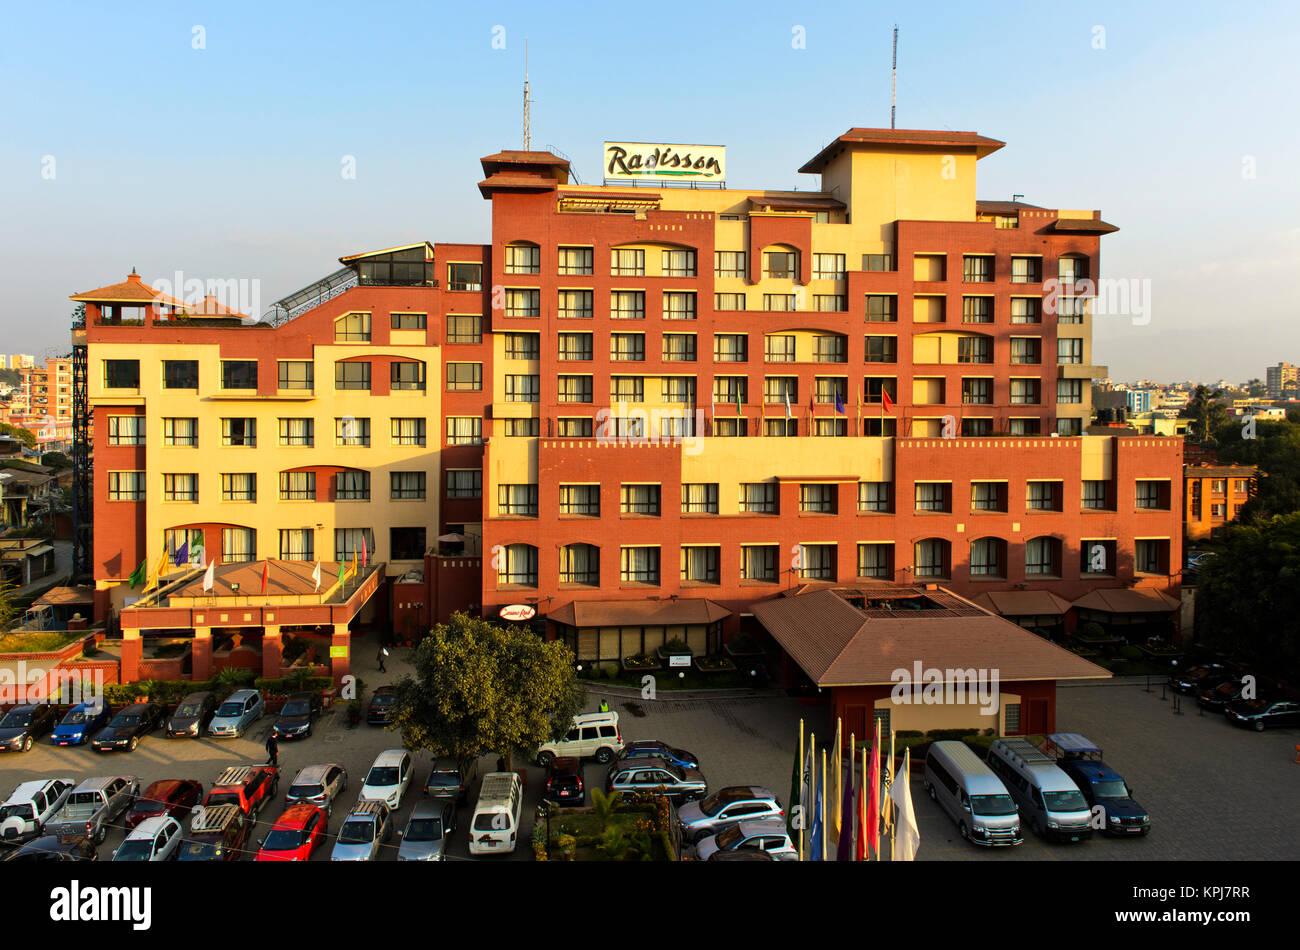 Hotel Radisson, Kathmandu, Nepal - Stock Image